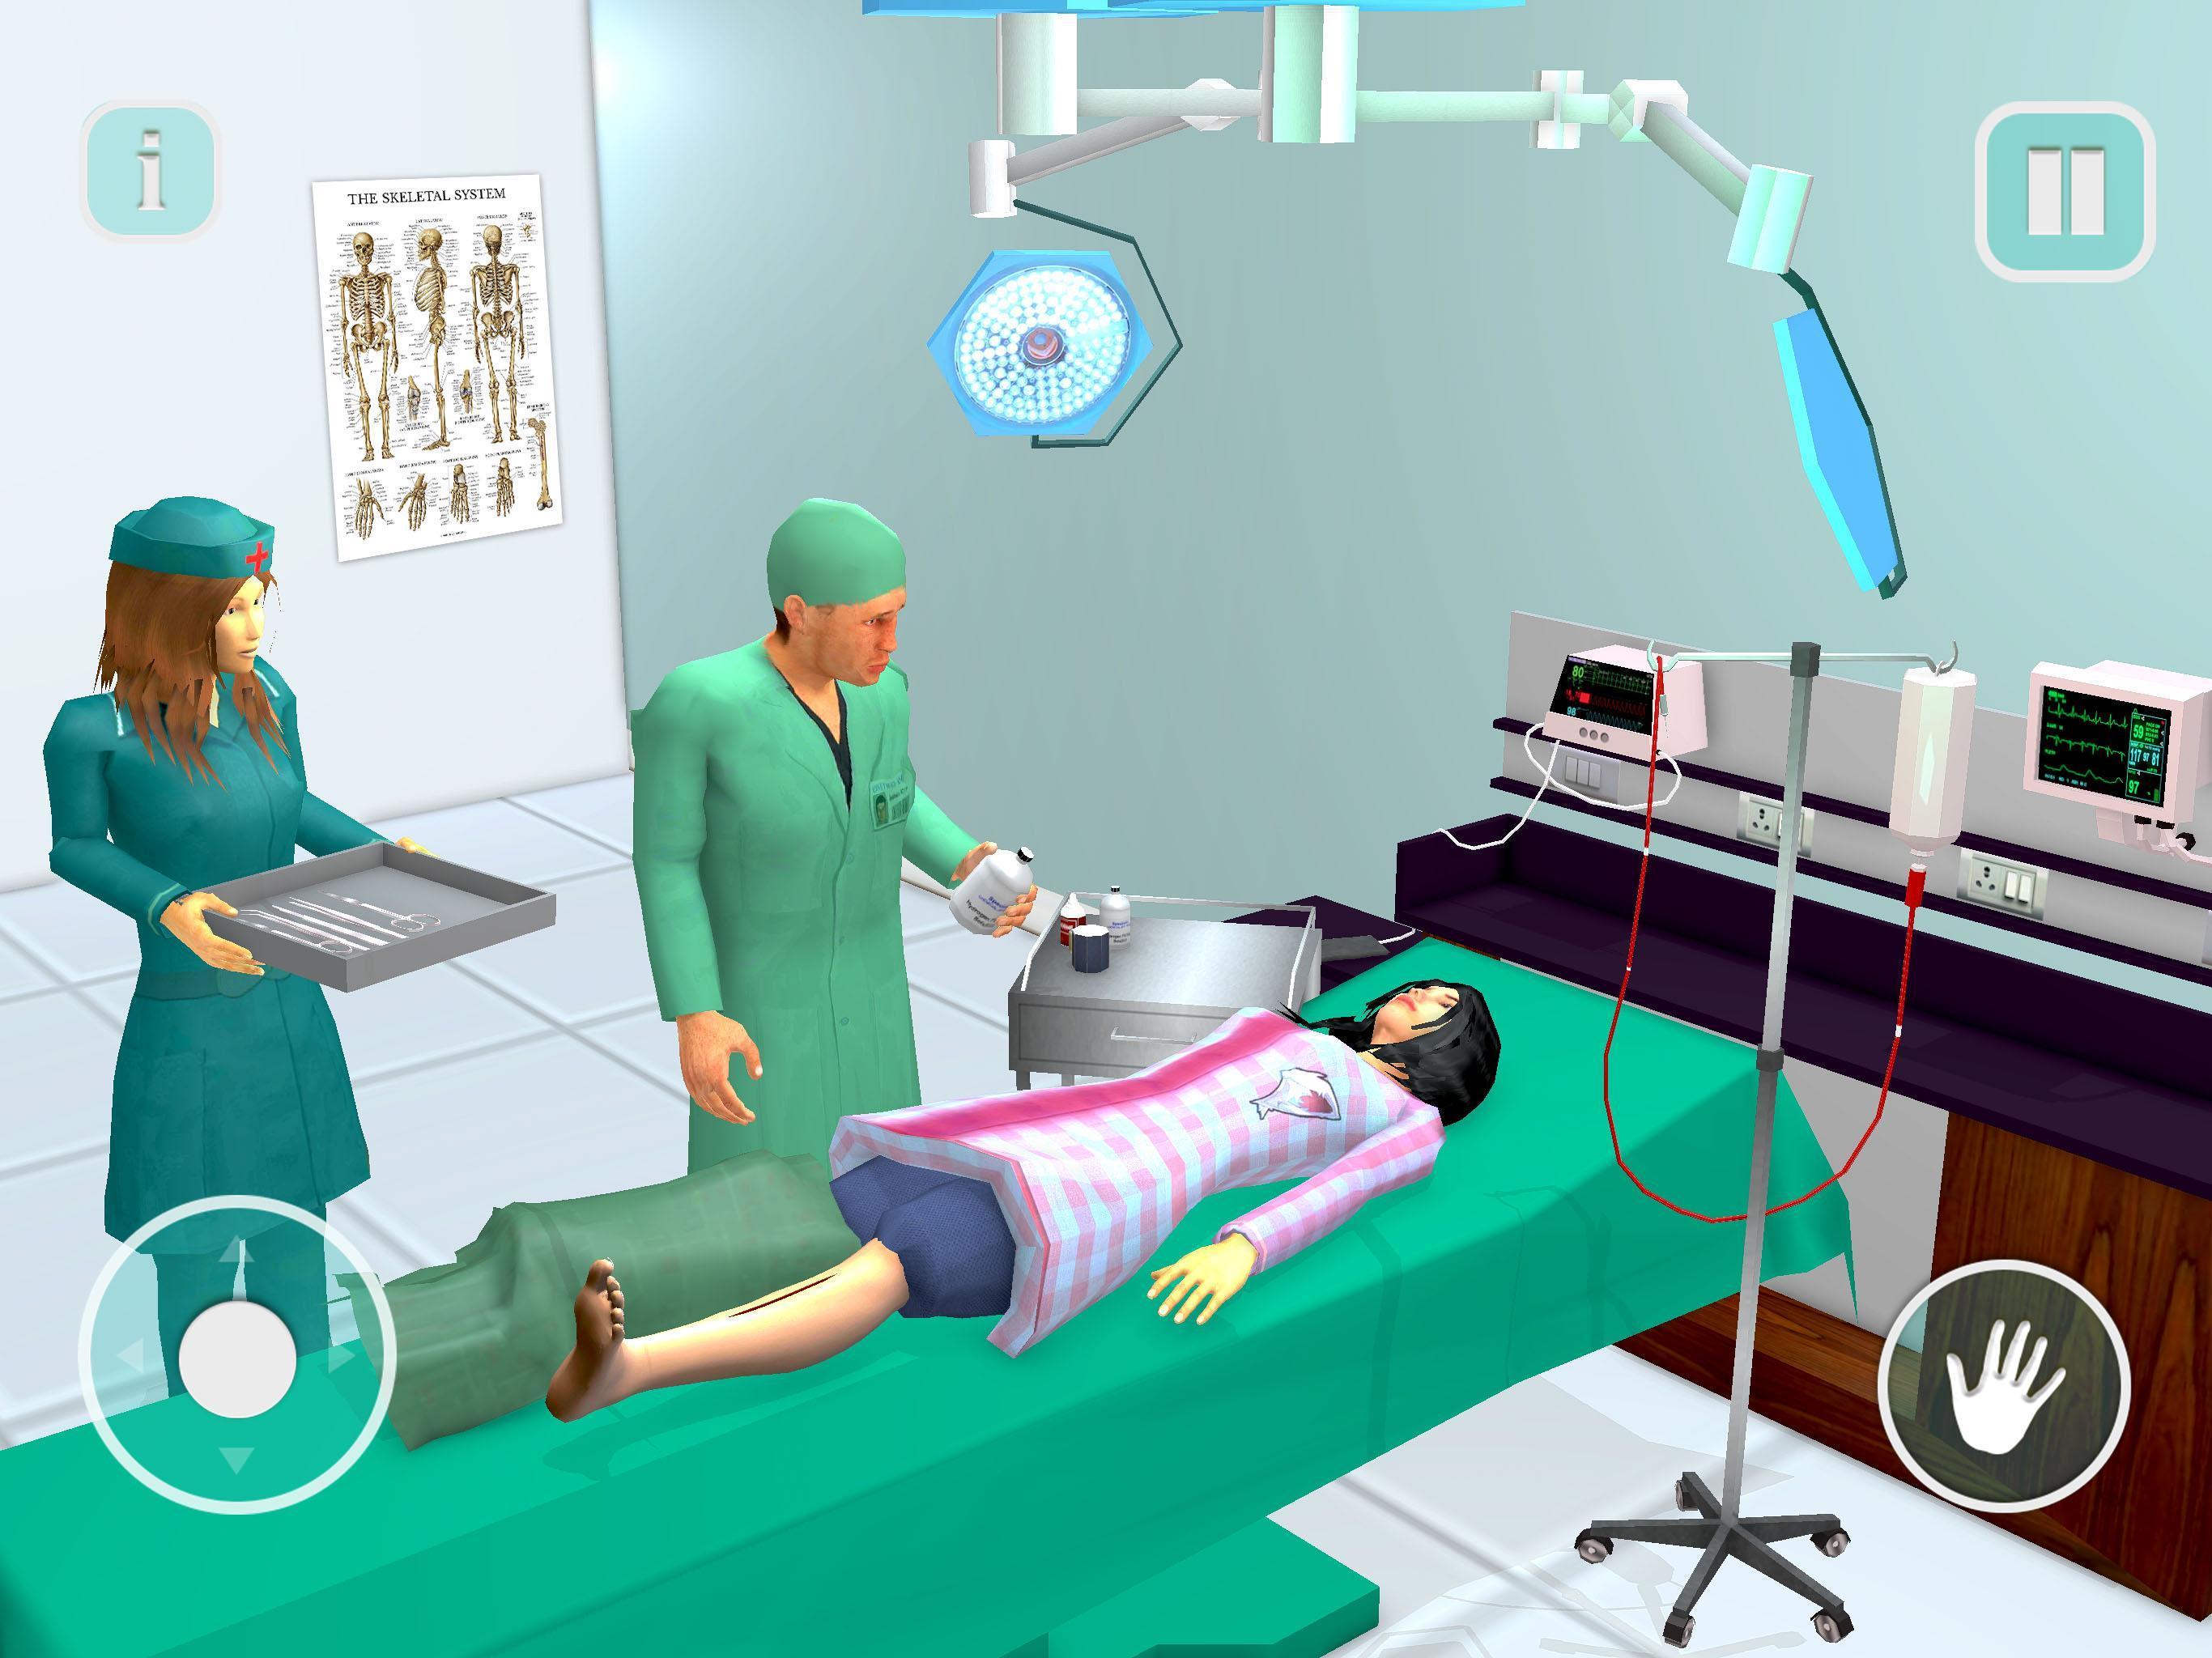 Hospital Simulator Roblox September Promo Codes For Roblox